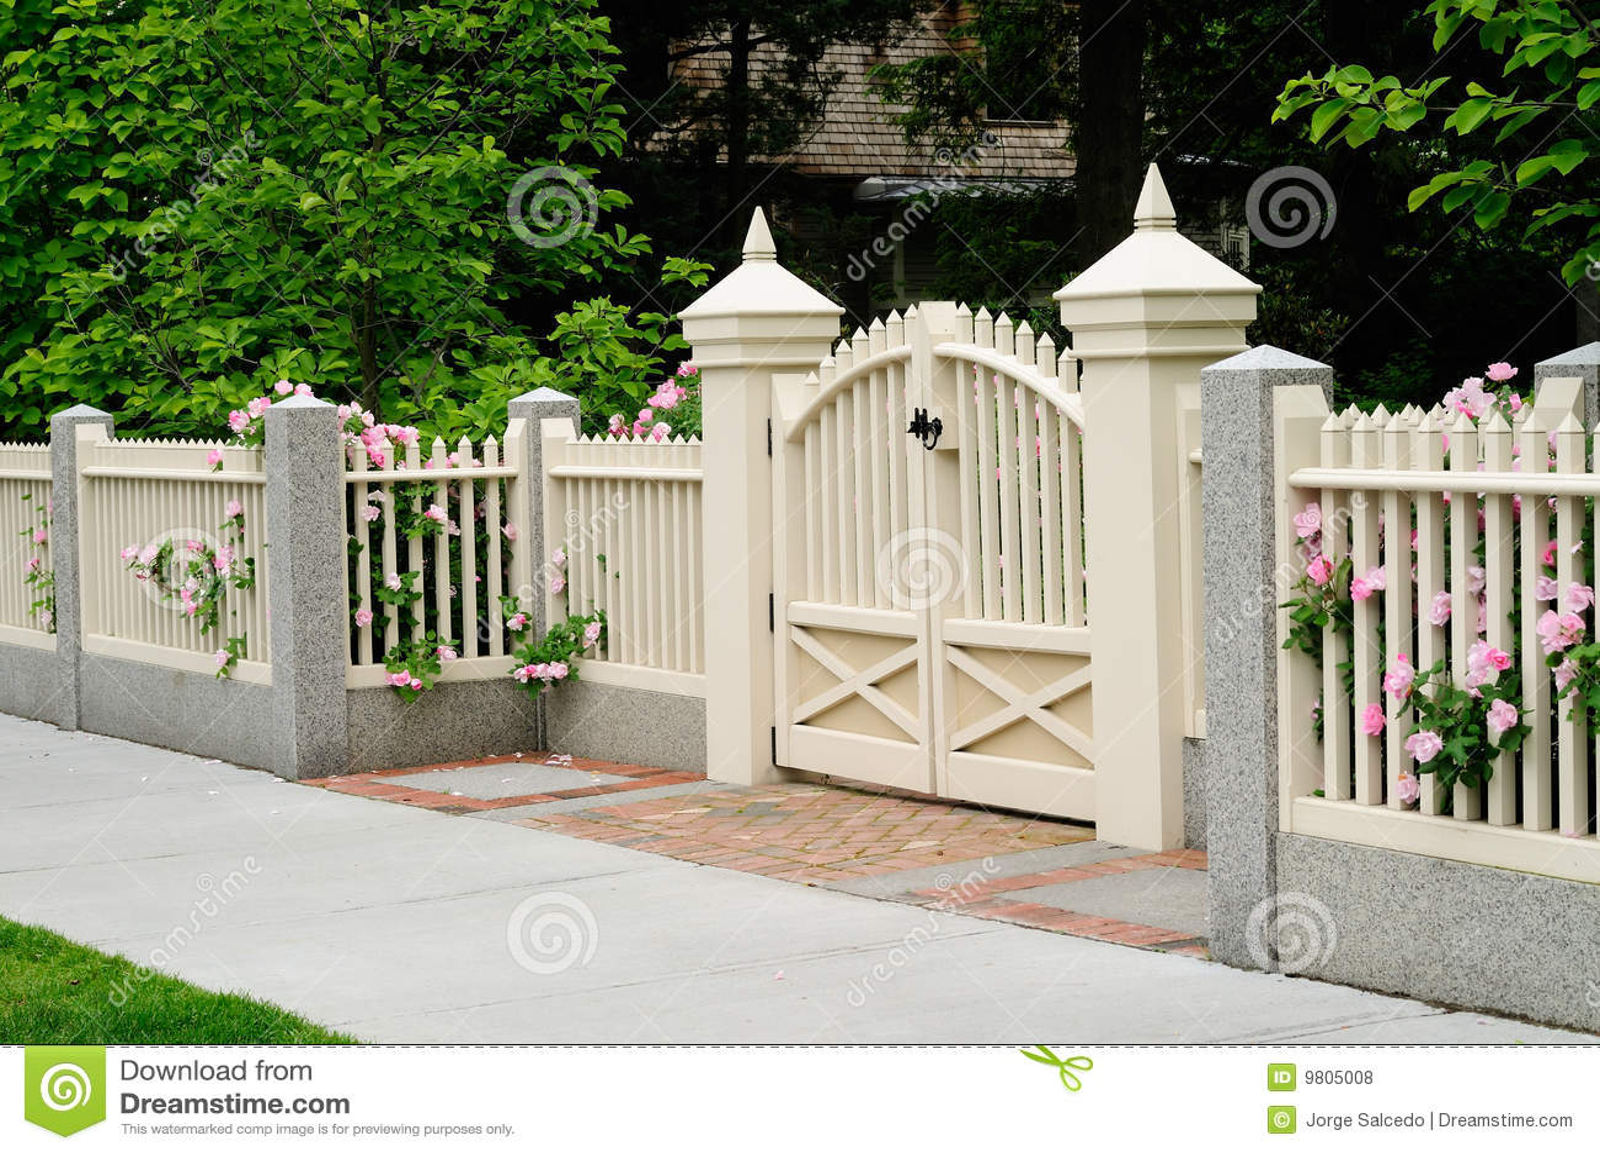 picket fence ideas pictures - Porta E Cerca Elegantes Na Entrada Da Casa Fotos de Stock